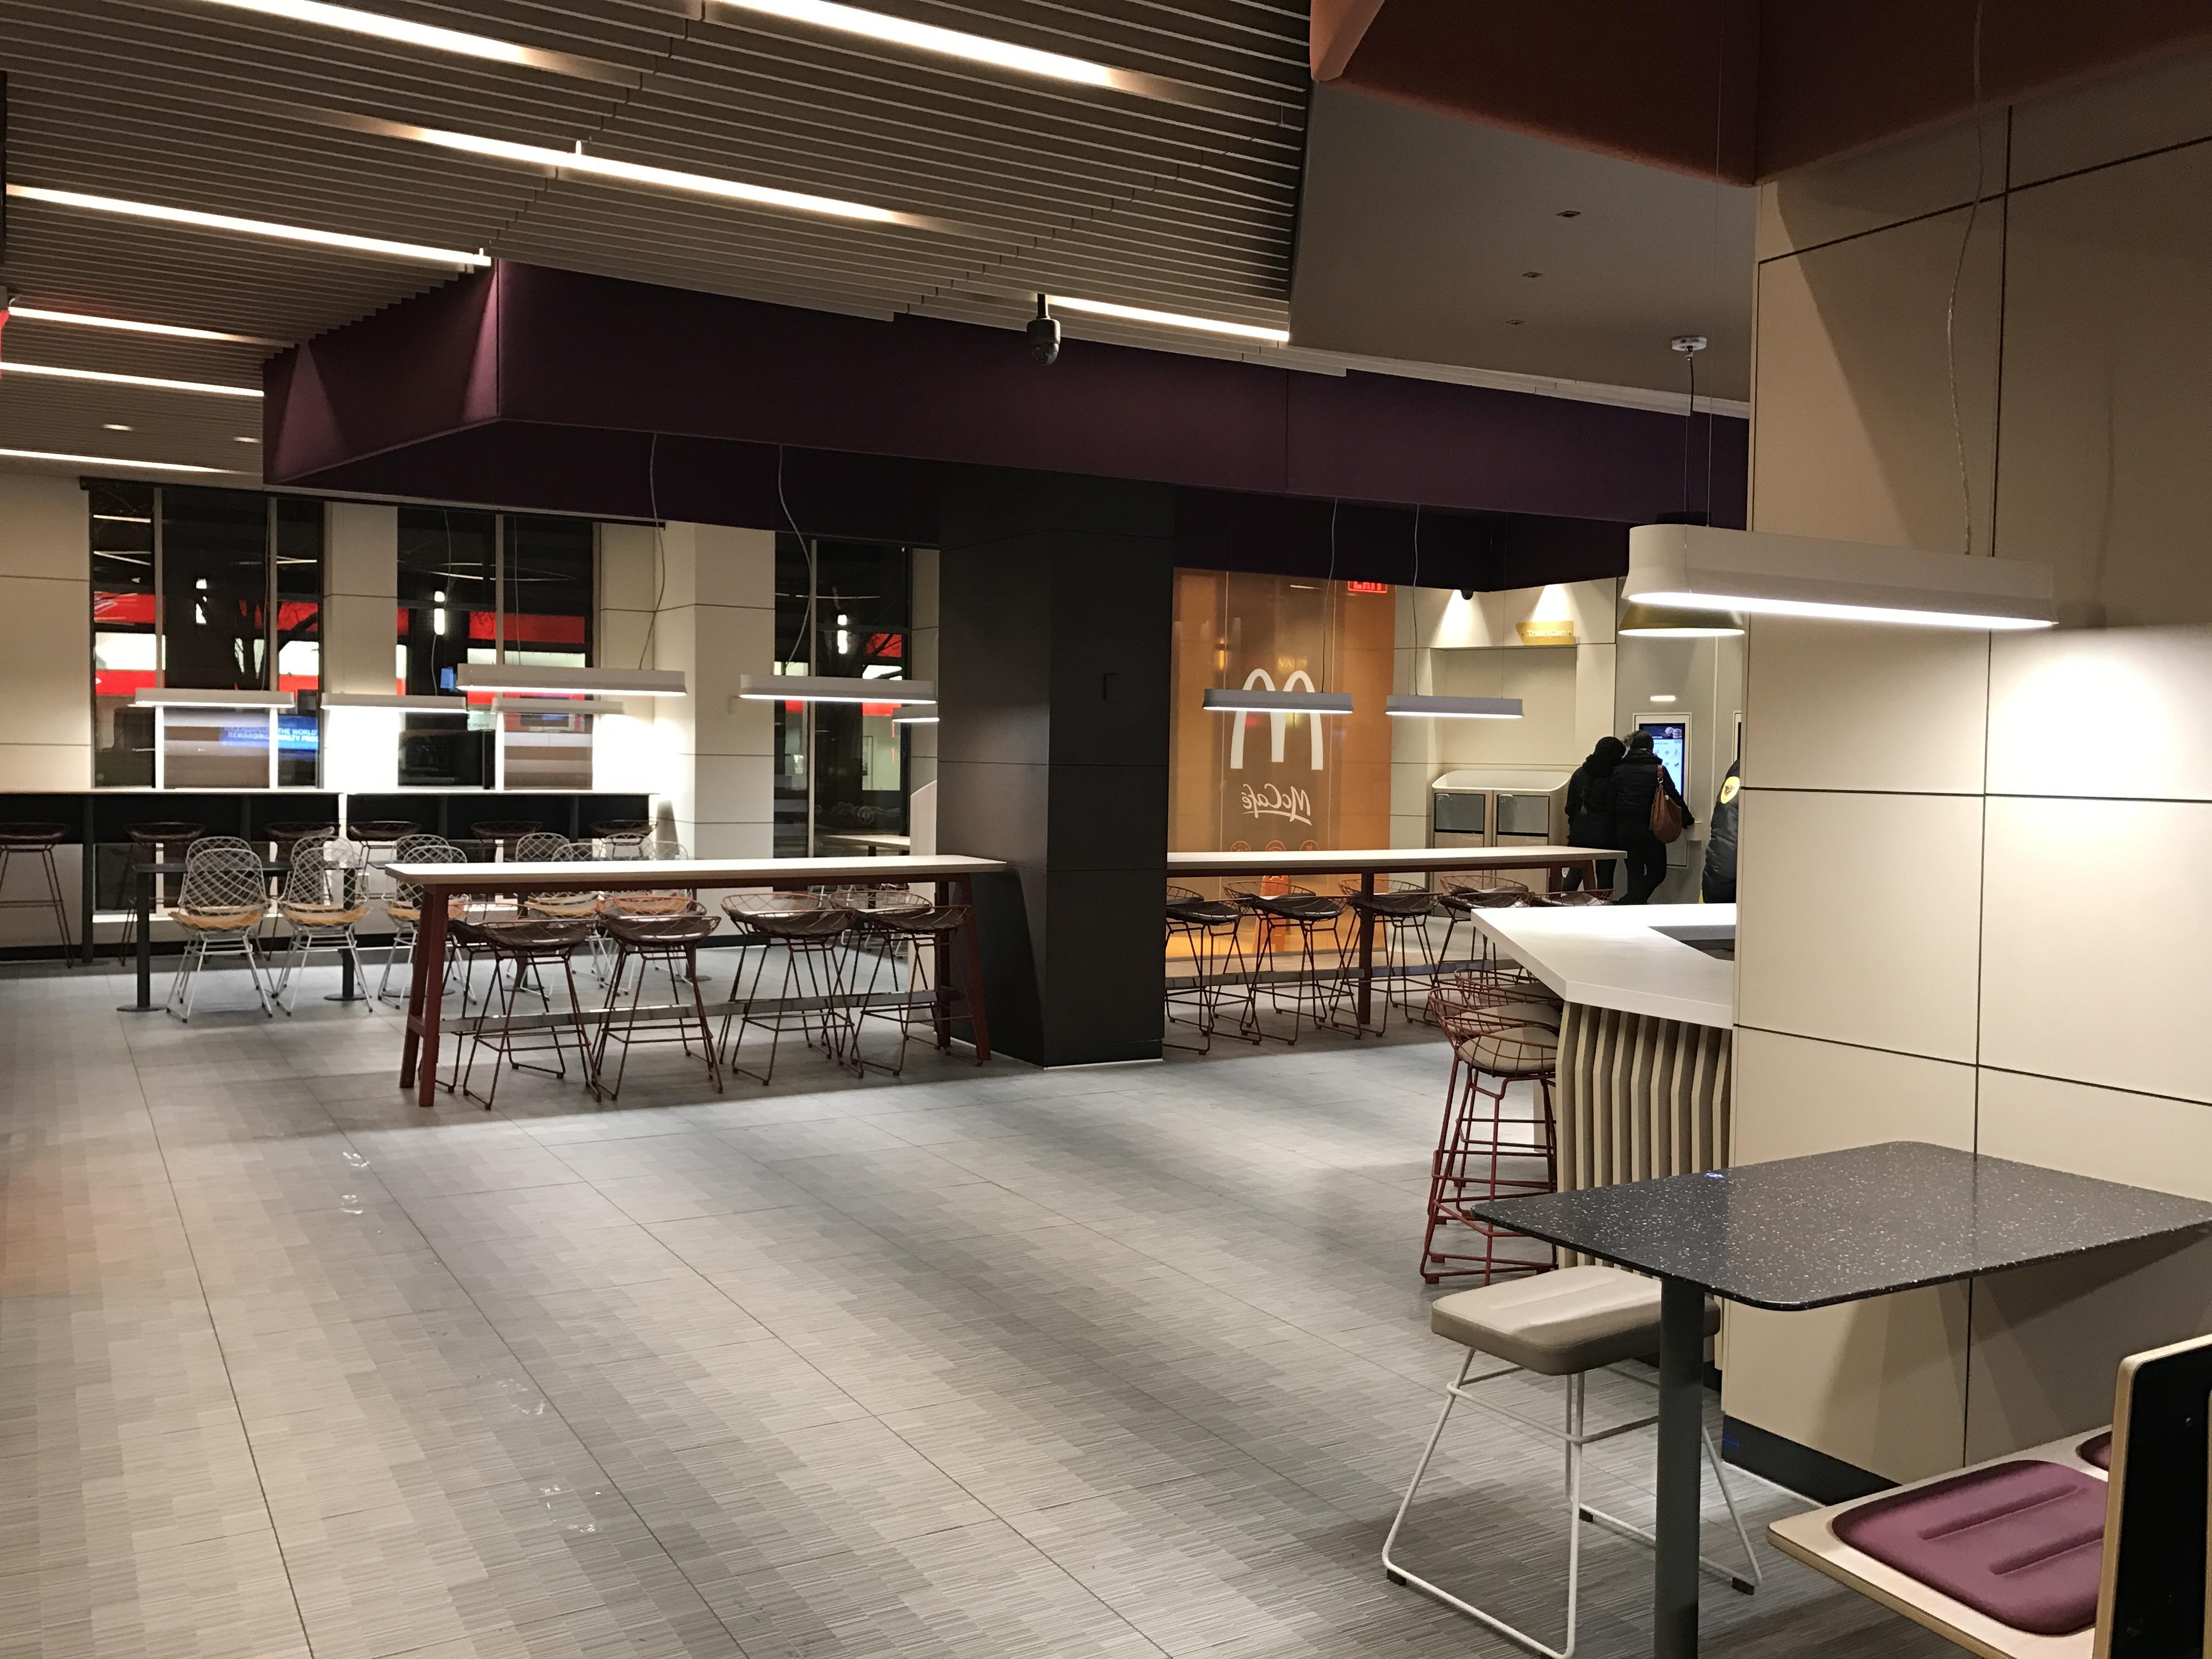 Manhattans Newest McDonalds Sells Chocolate Croissants